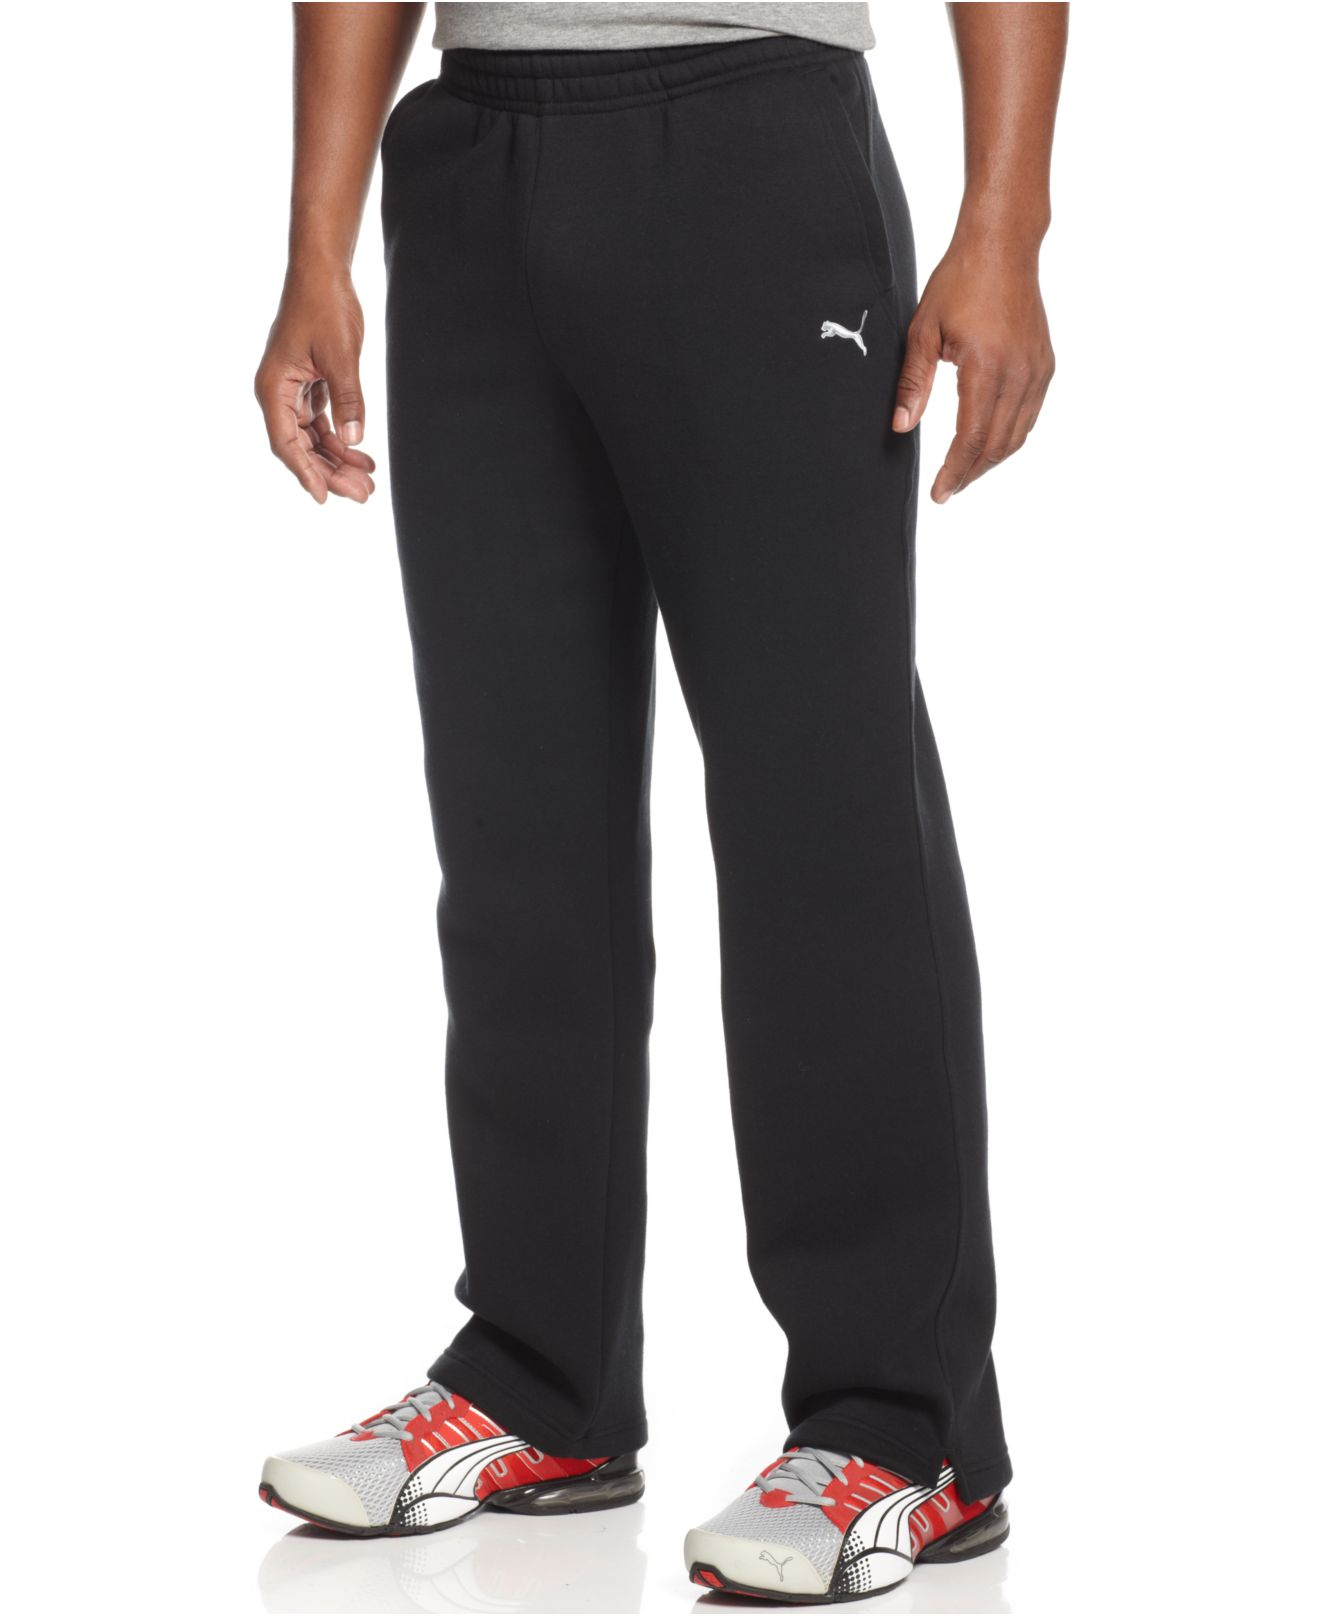 Puma Men S Drawstring Fleece Sweatpants In Black For Men